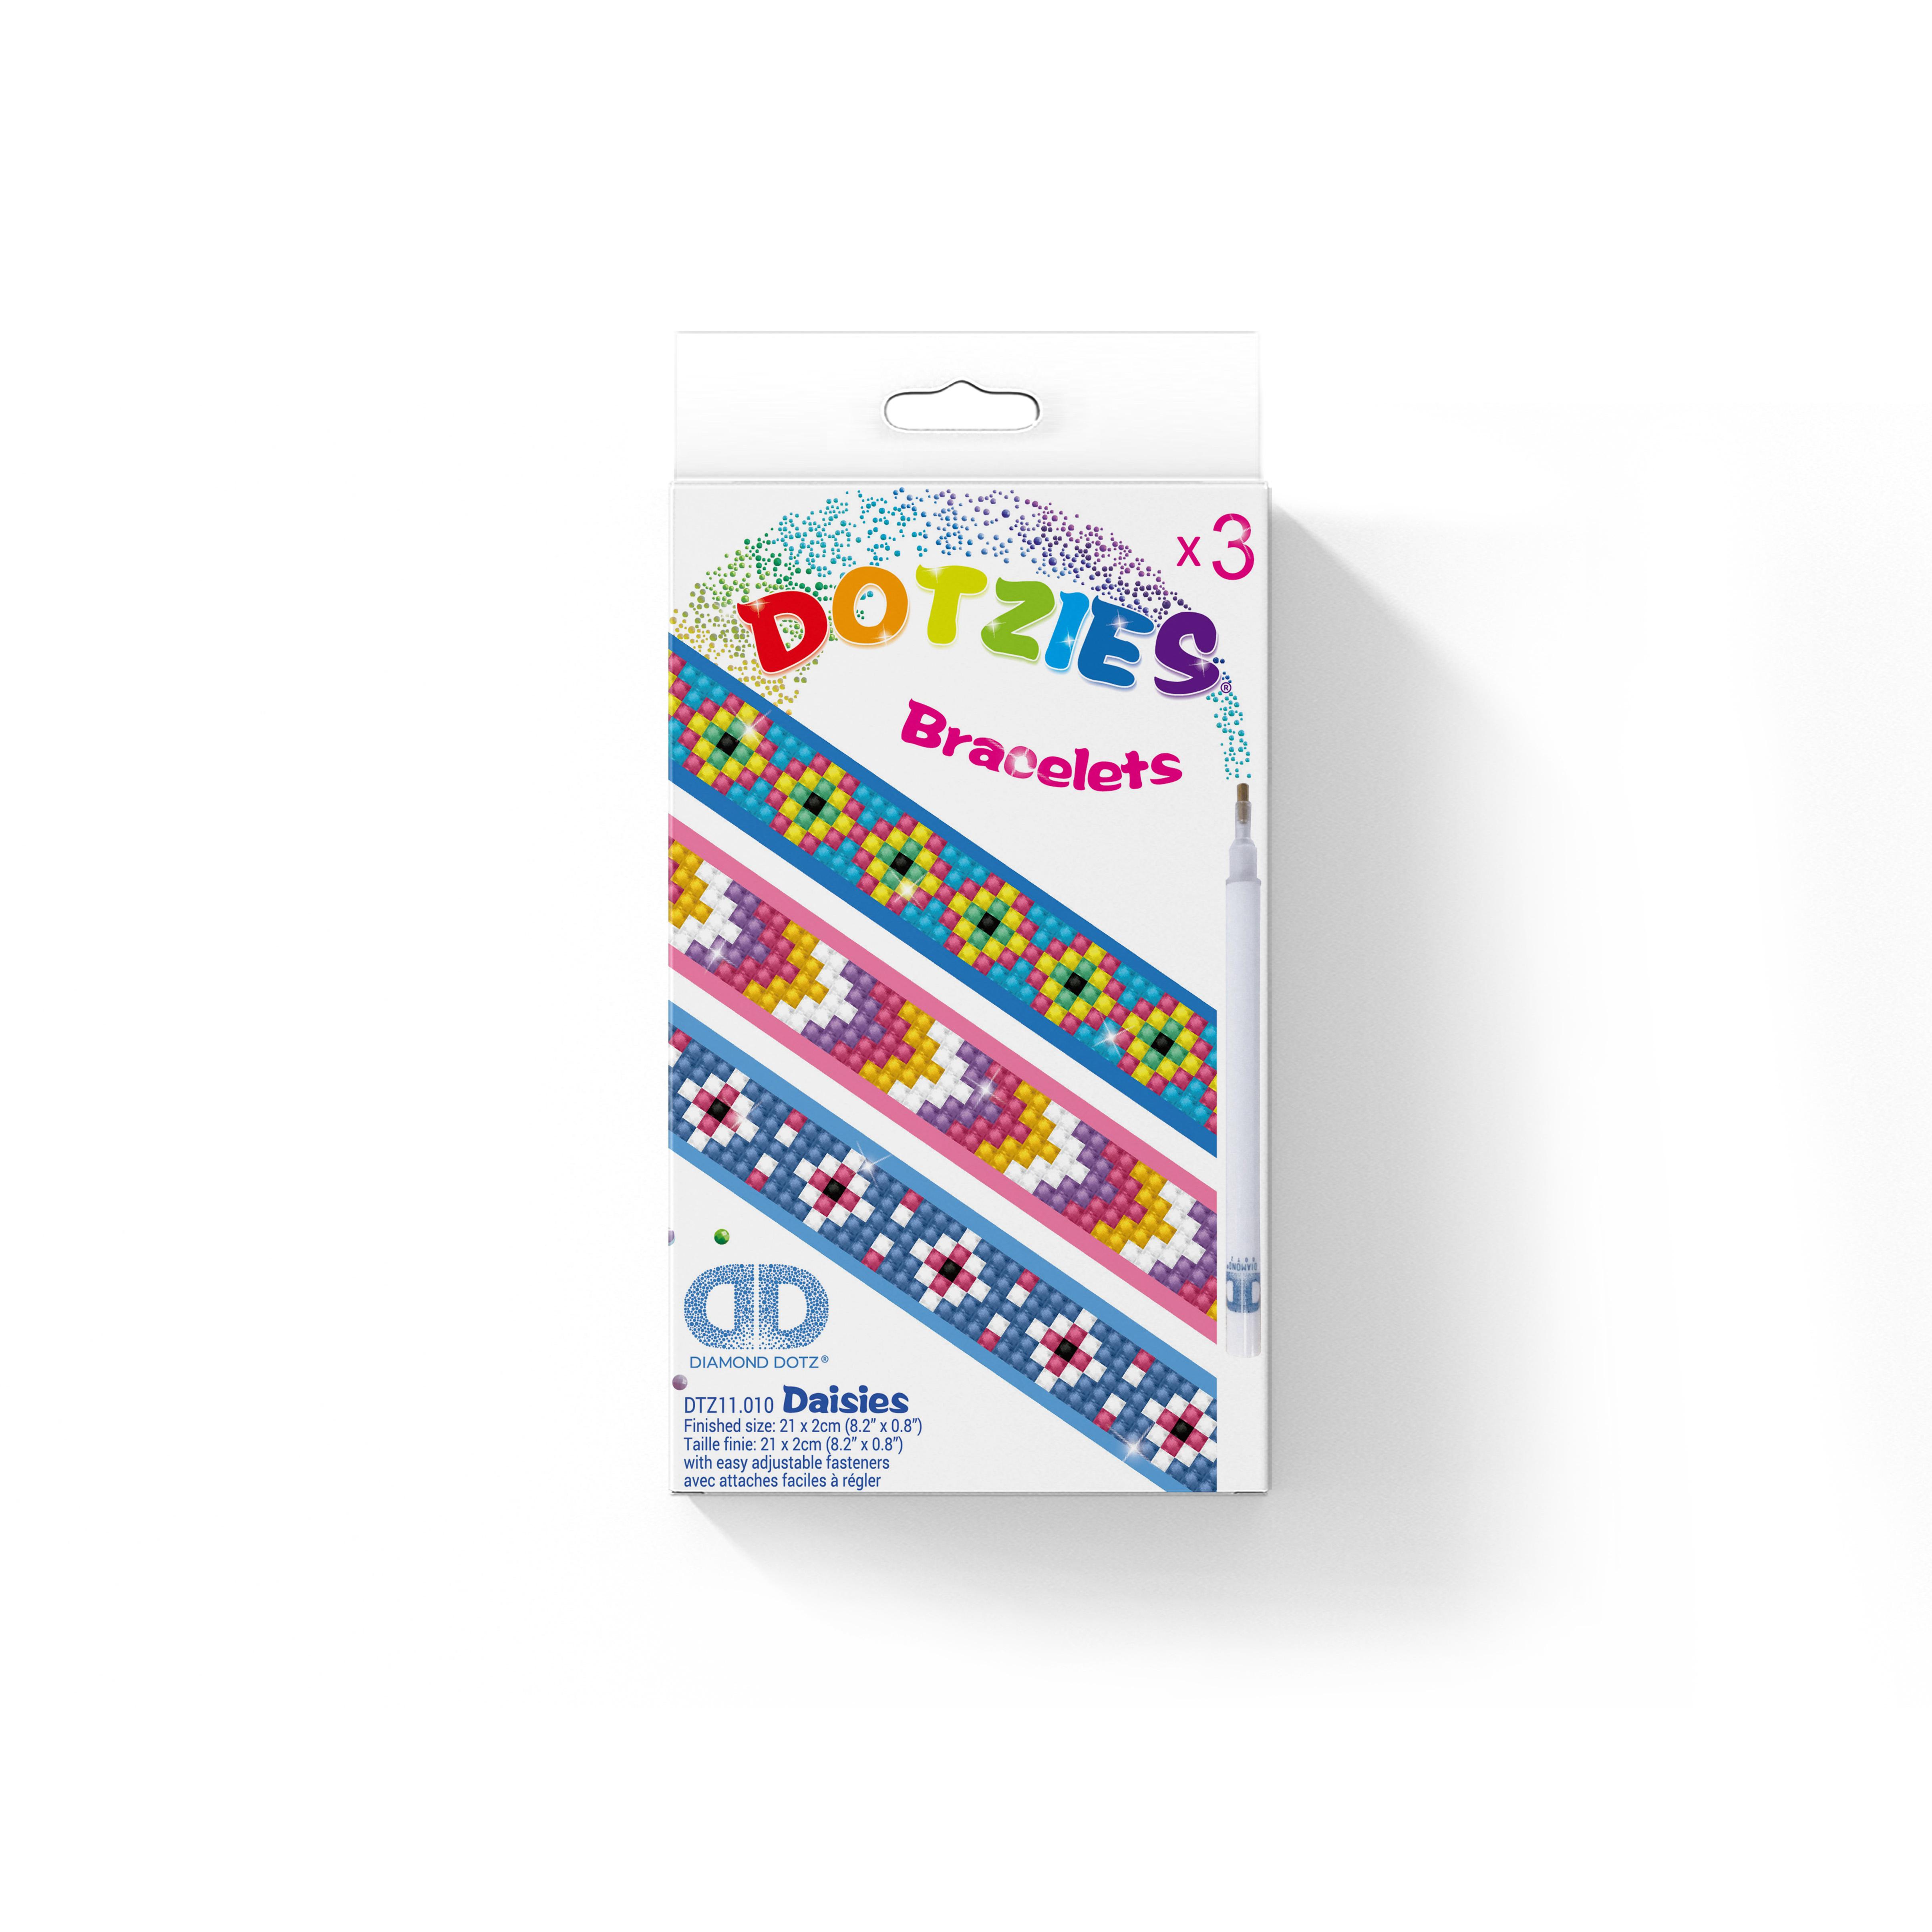 DTZ11.010_packaging